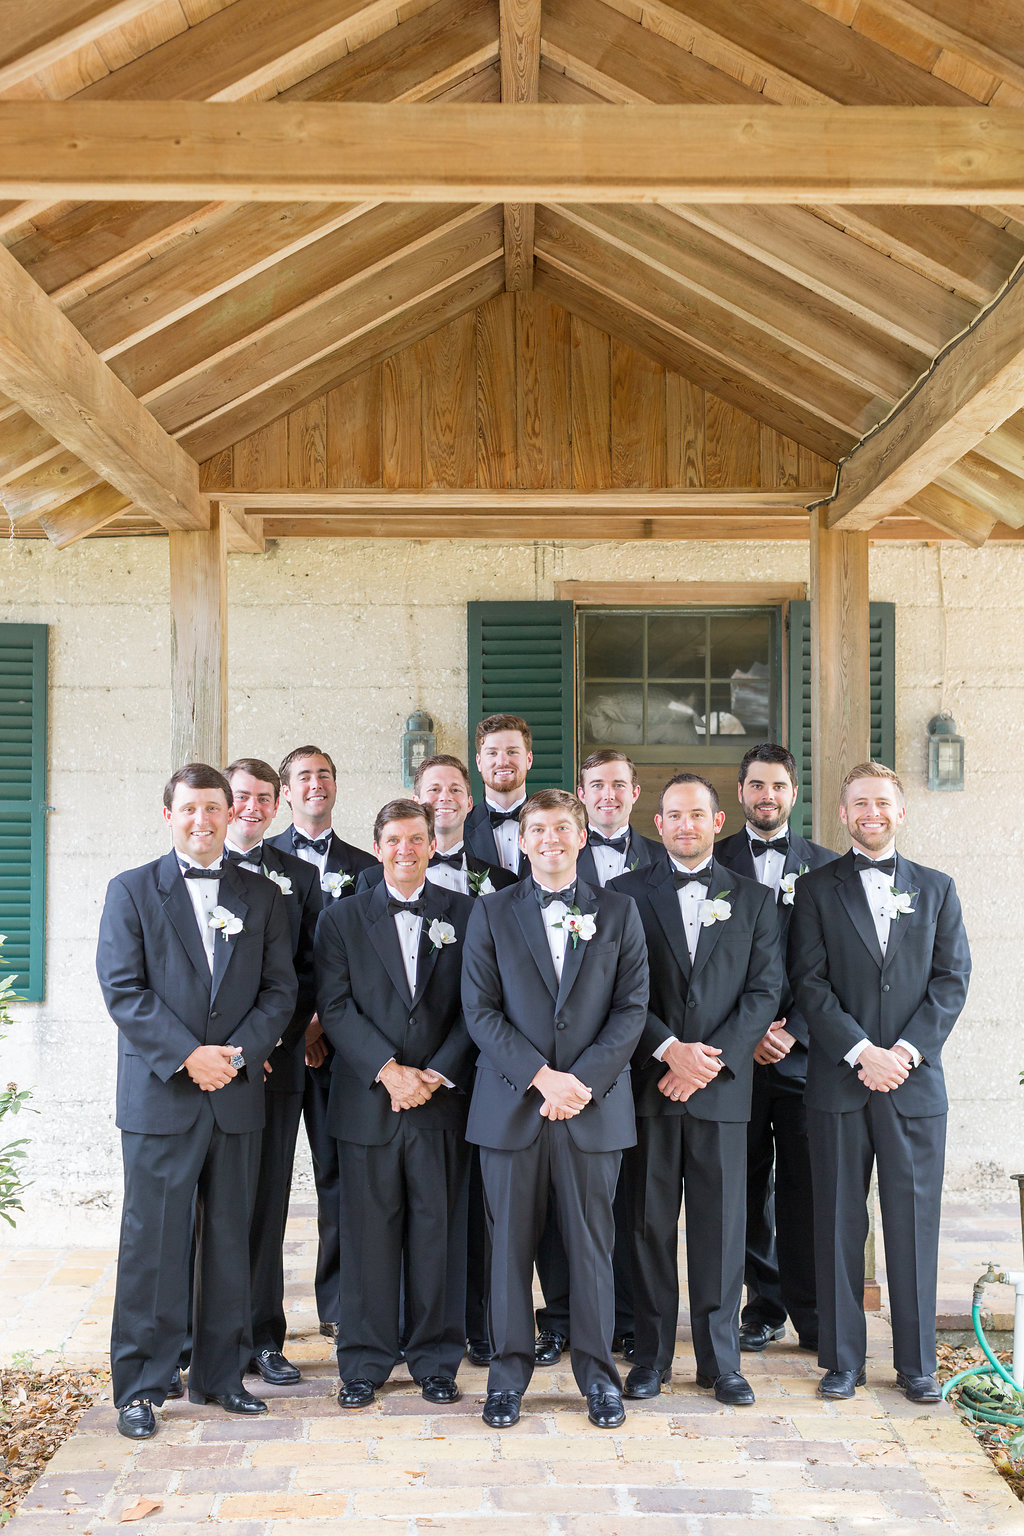 Groomsmen Photos - Musgrove Plantation Georgia Wedding Venue